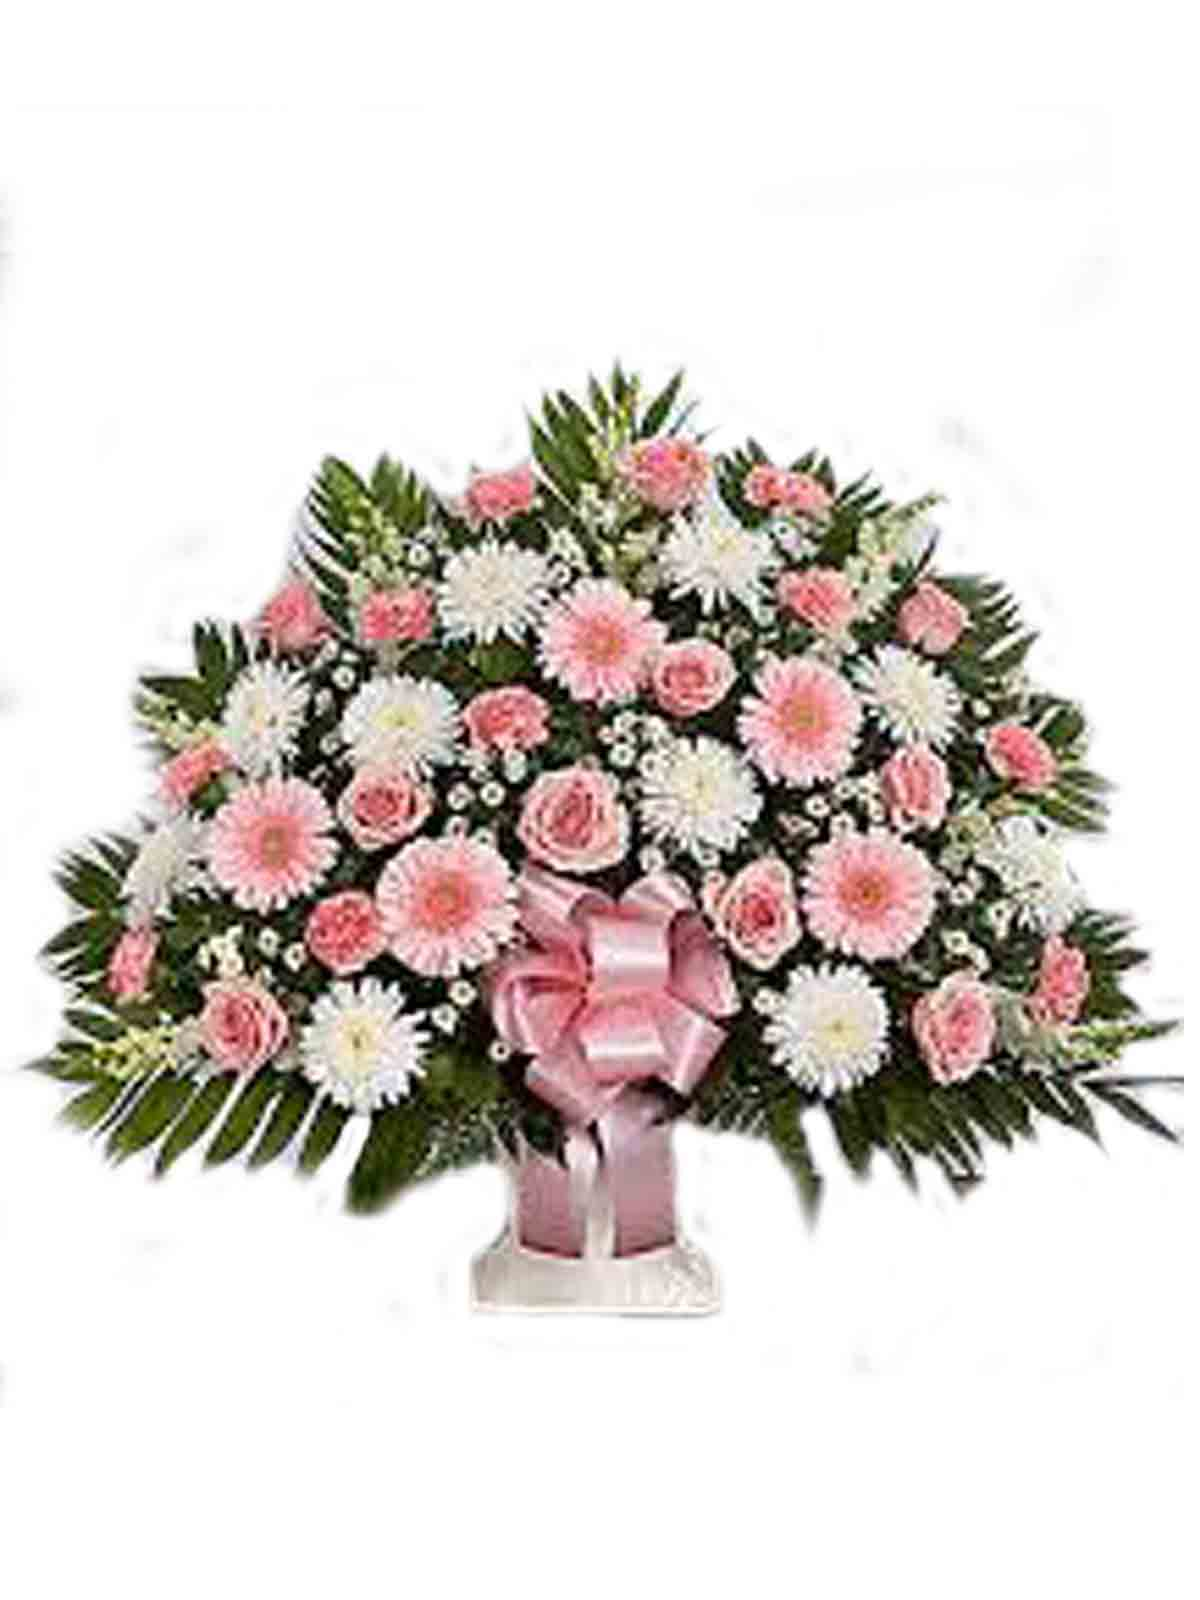 1127 Funeral Basket 007